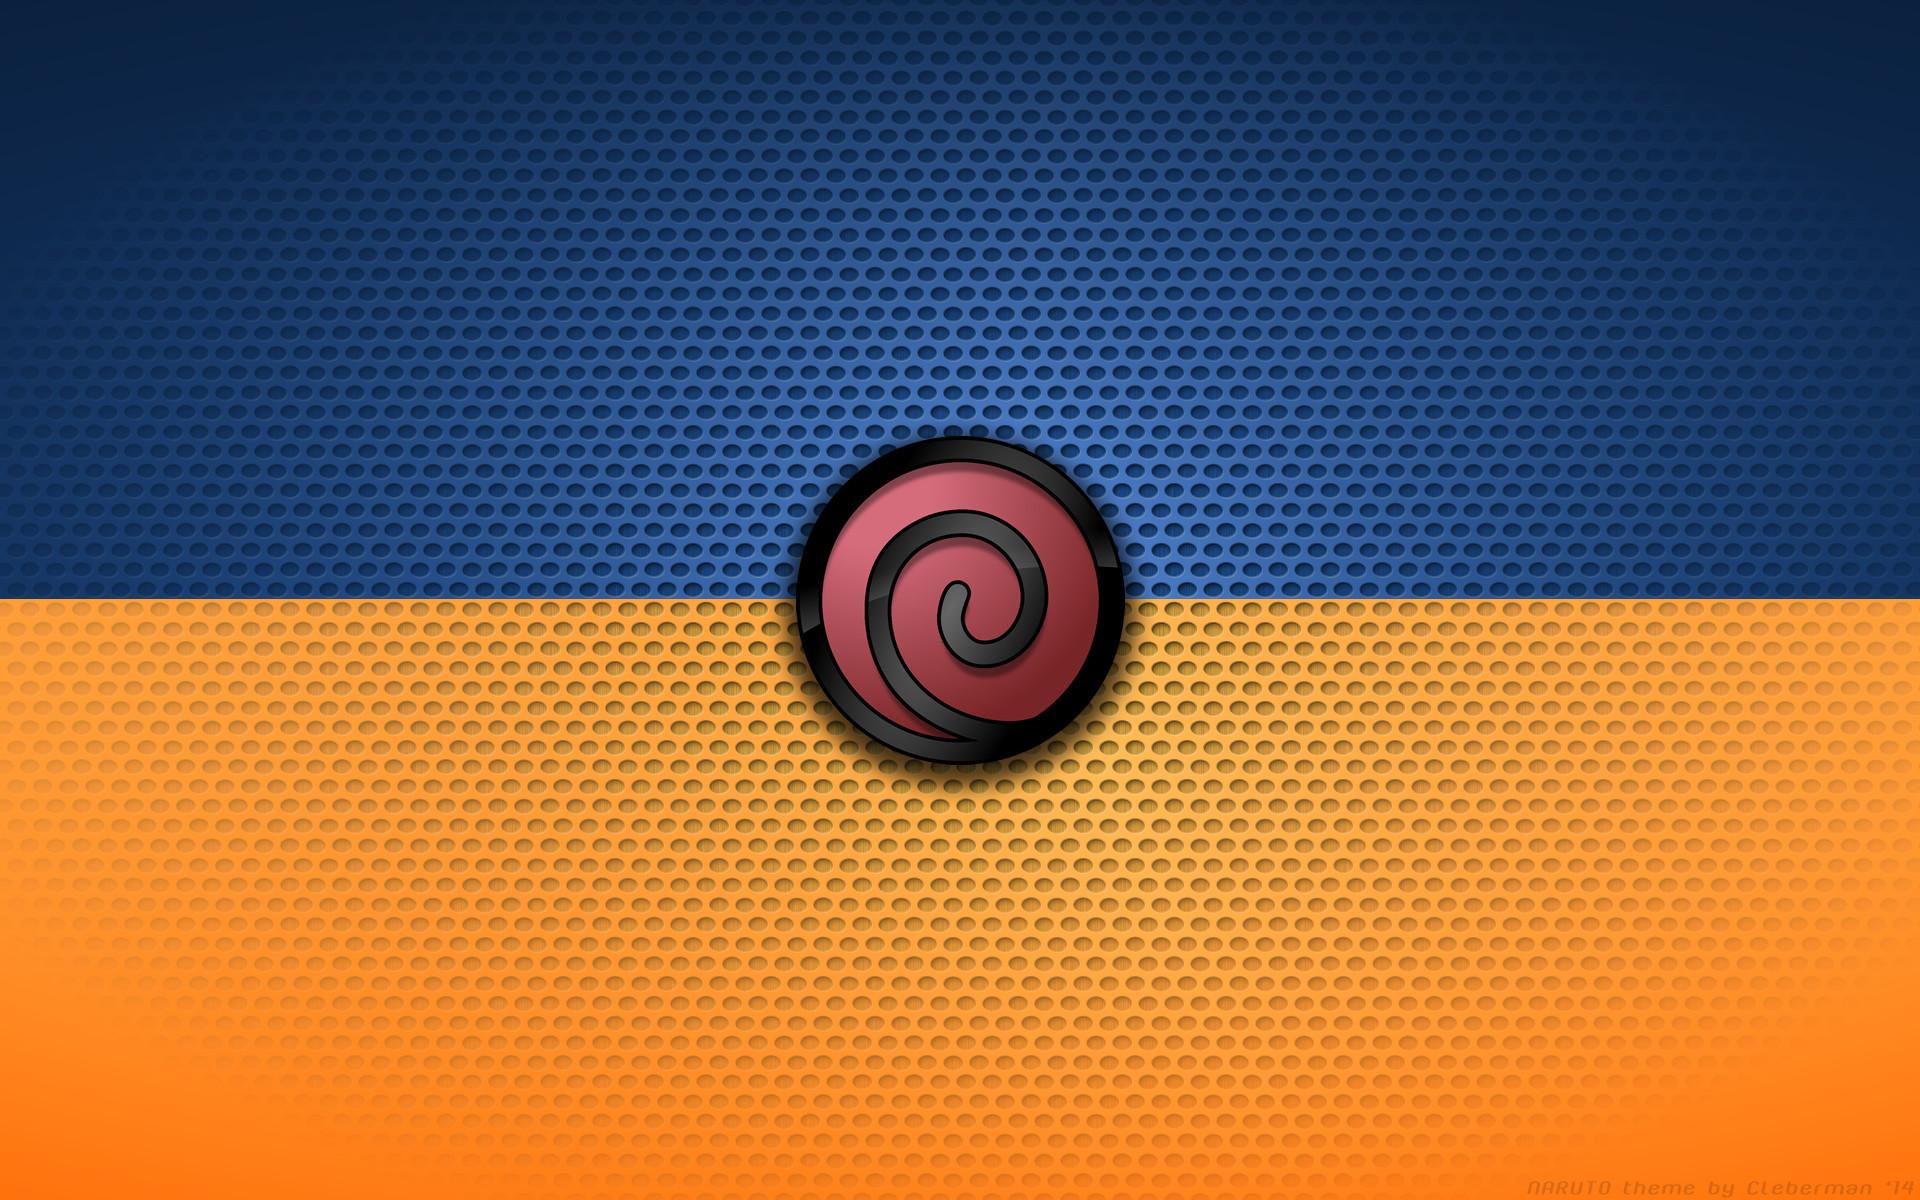 Konoha Logo Wallpaper 183 ① Wallpapertag